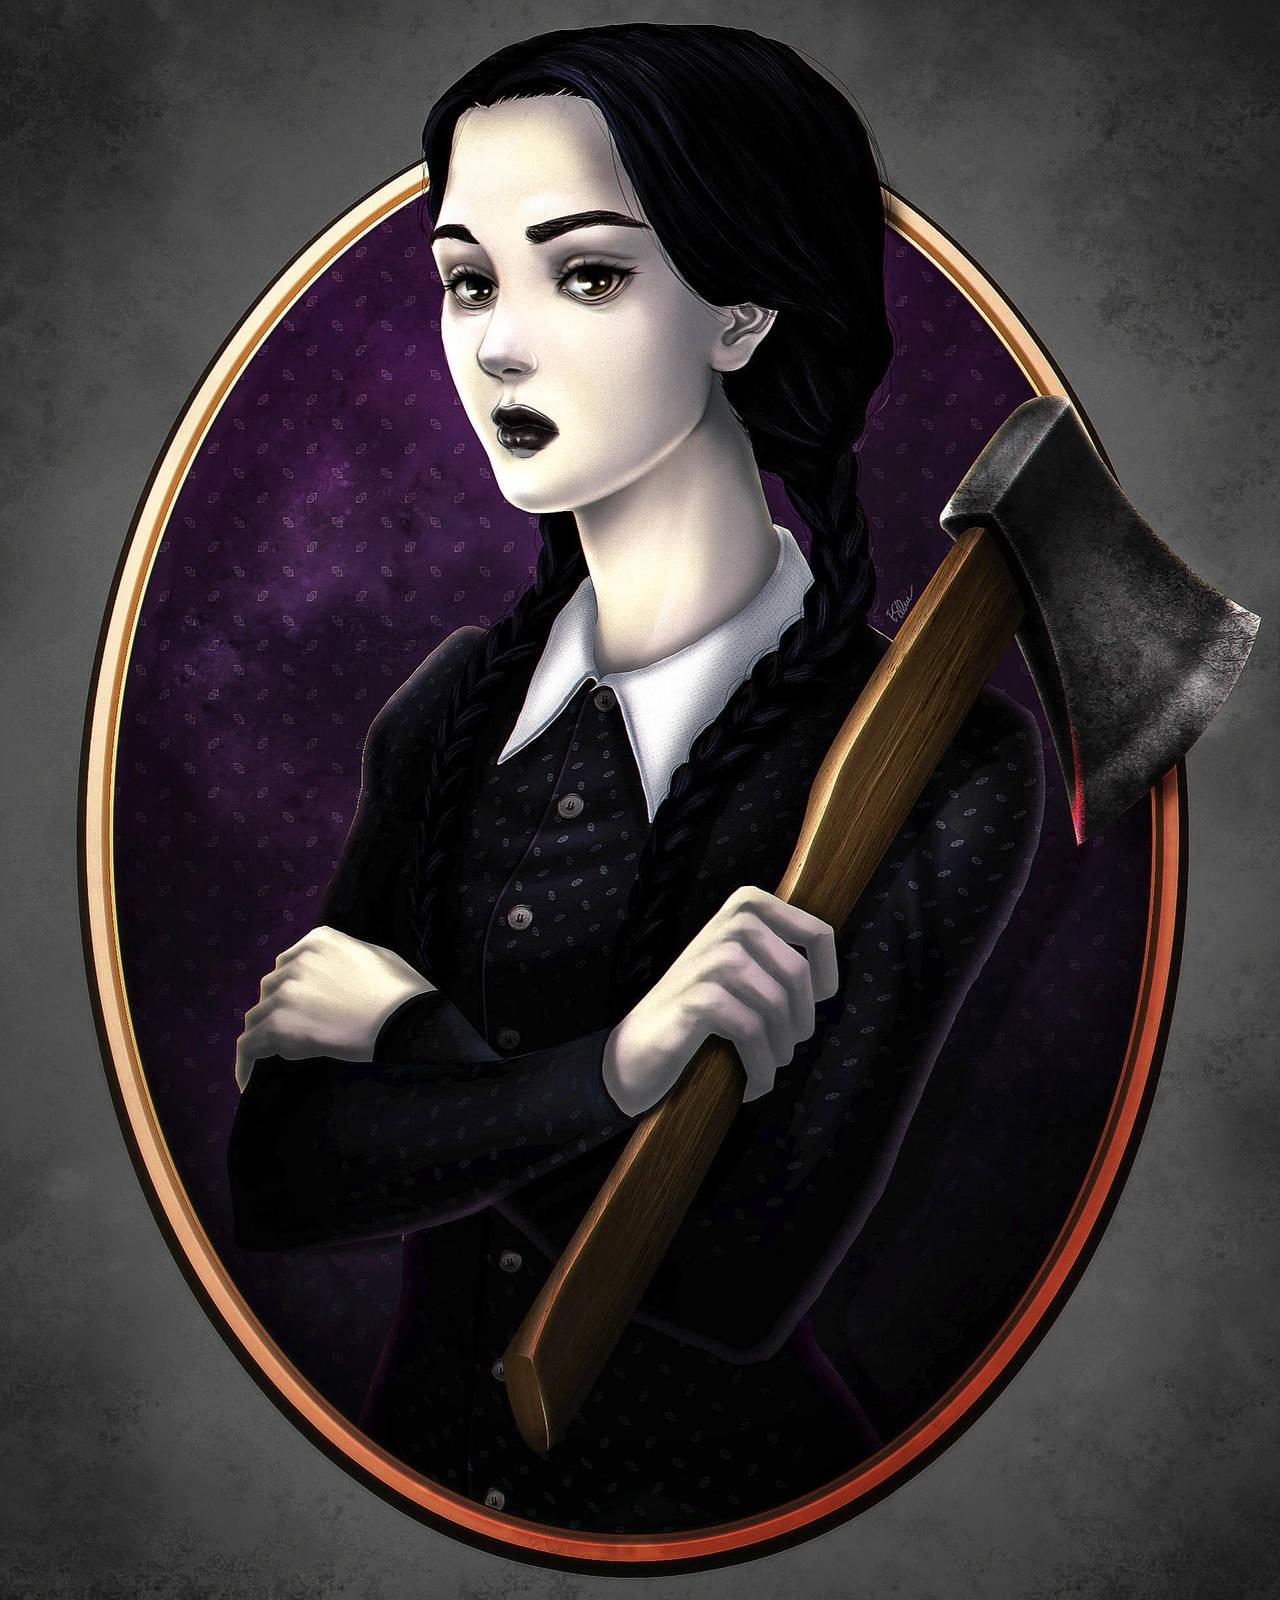 Adult Wednesday Addams by eldridgeque